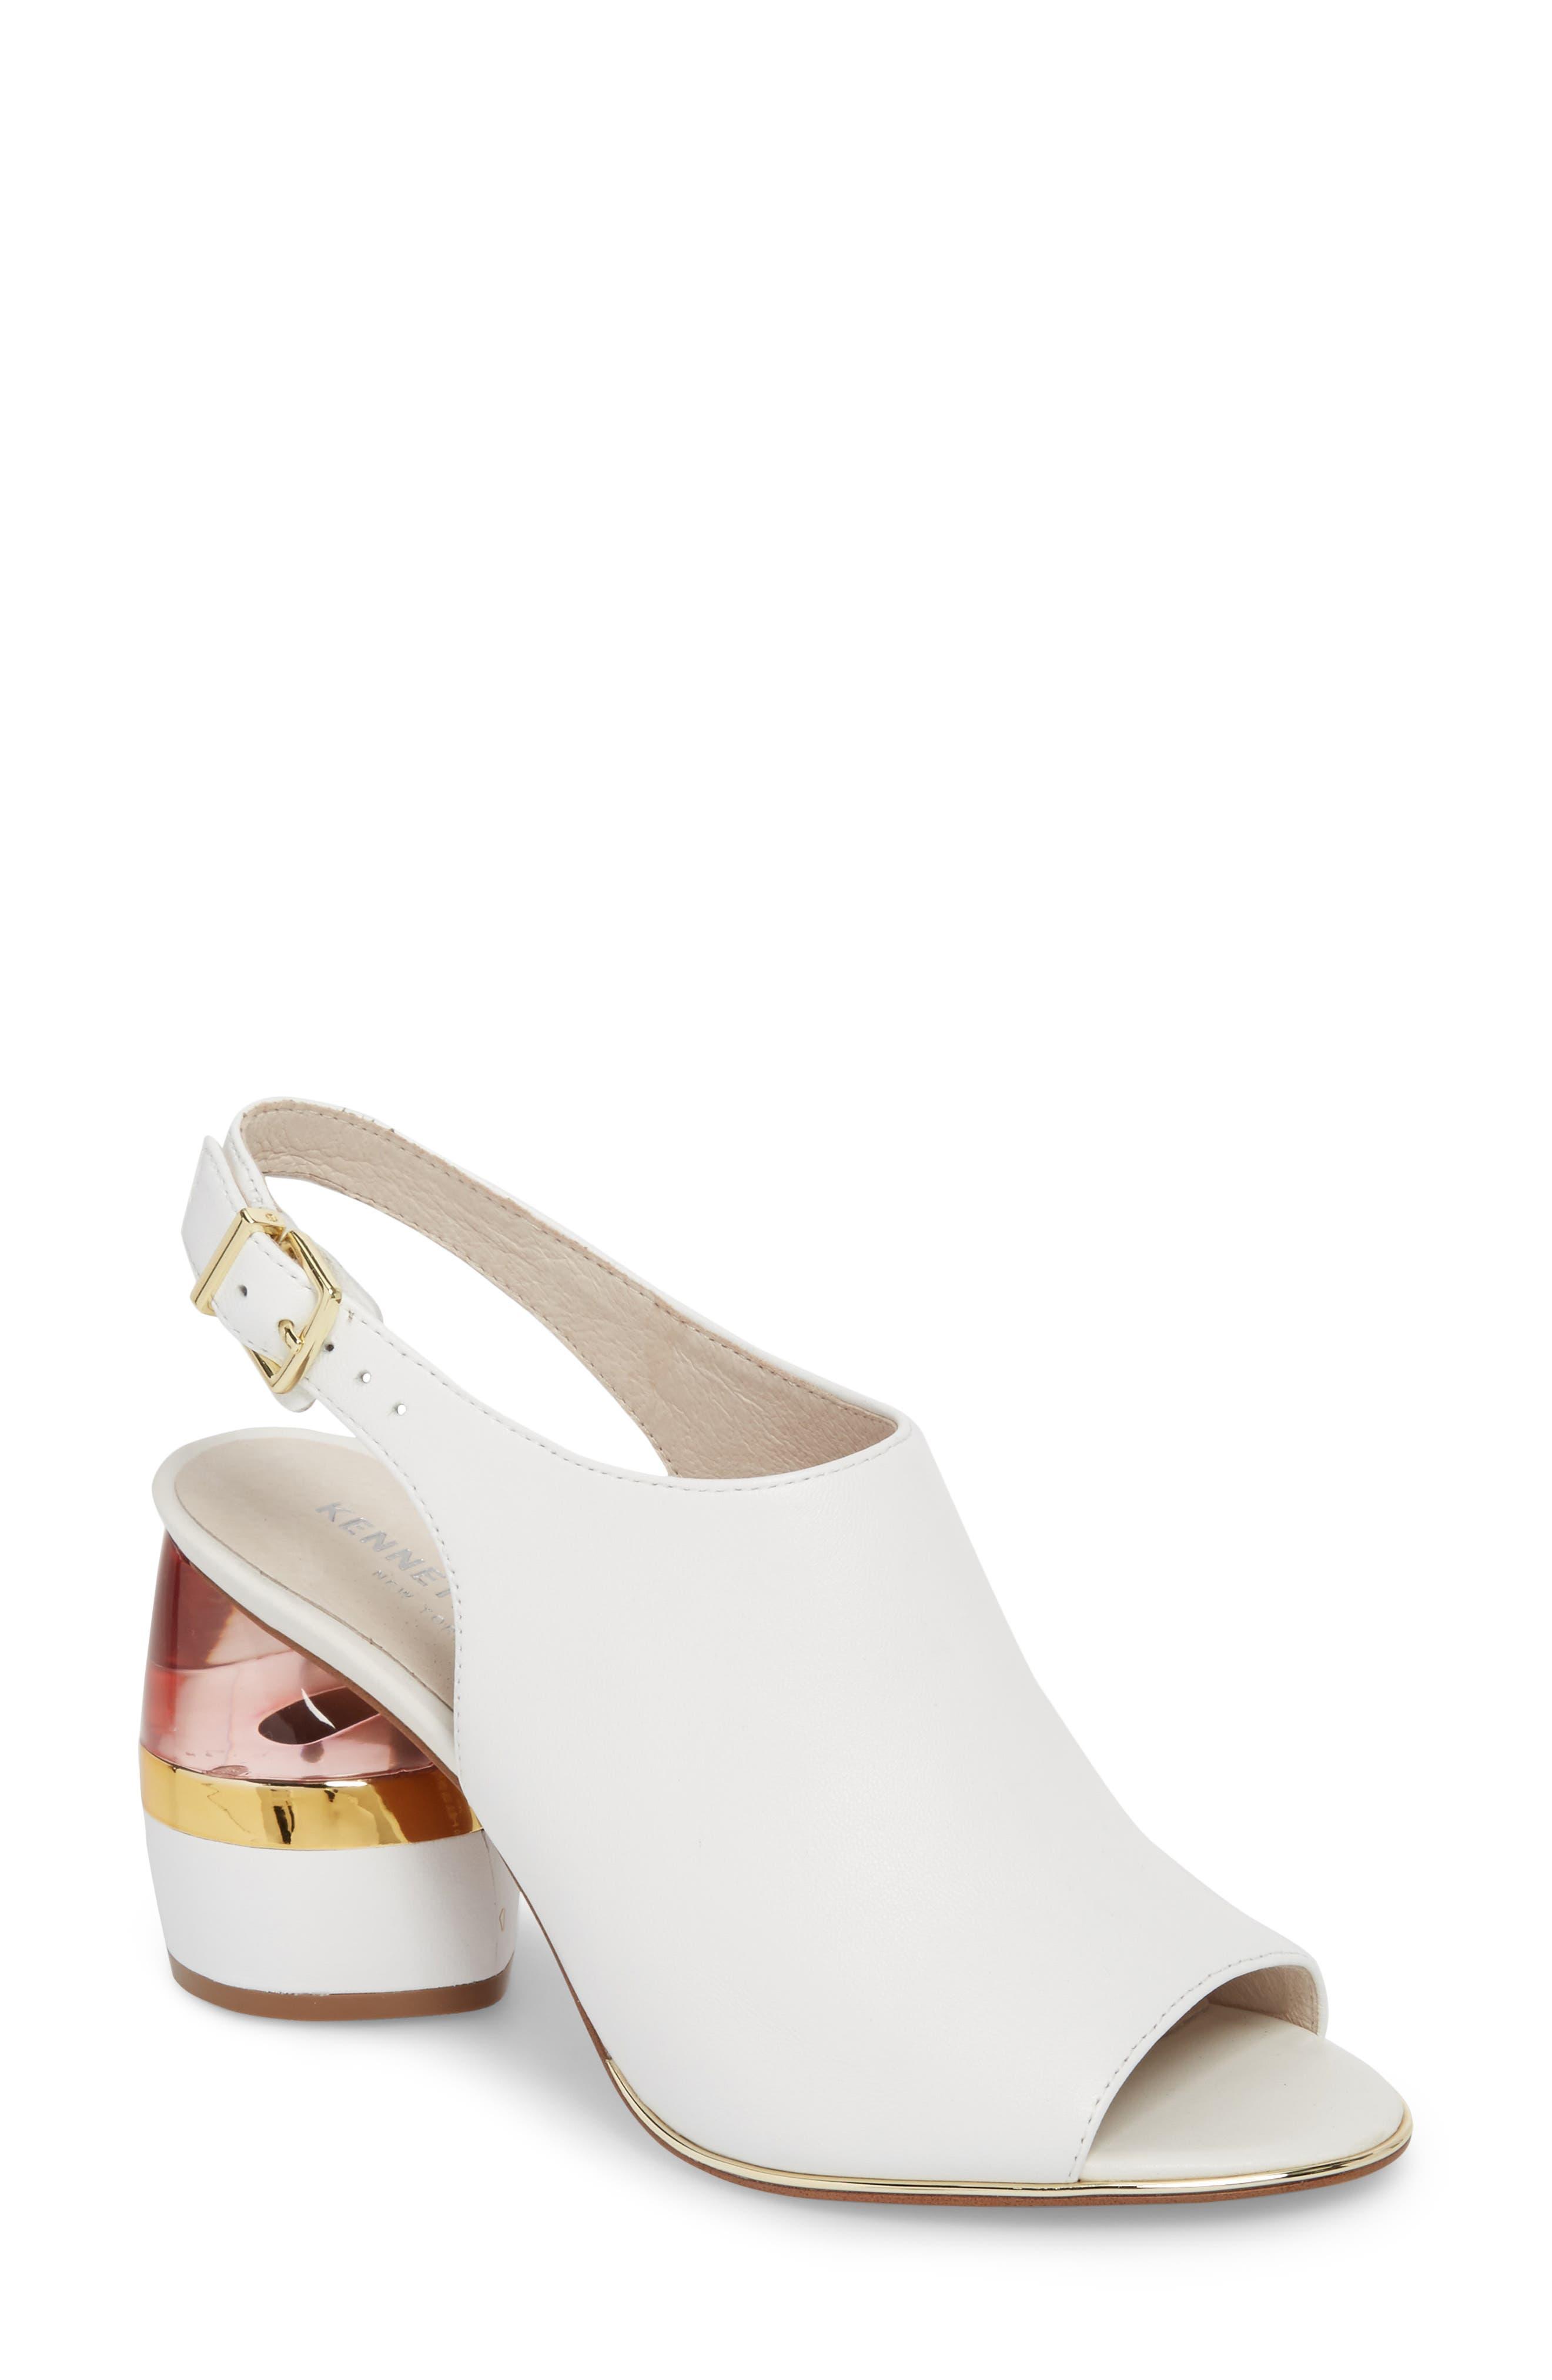 Kenneth Cole New York Lovelle Statement Heel Sandal (Women)